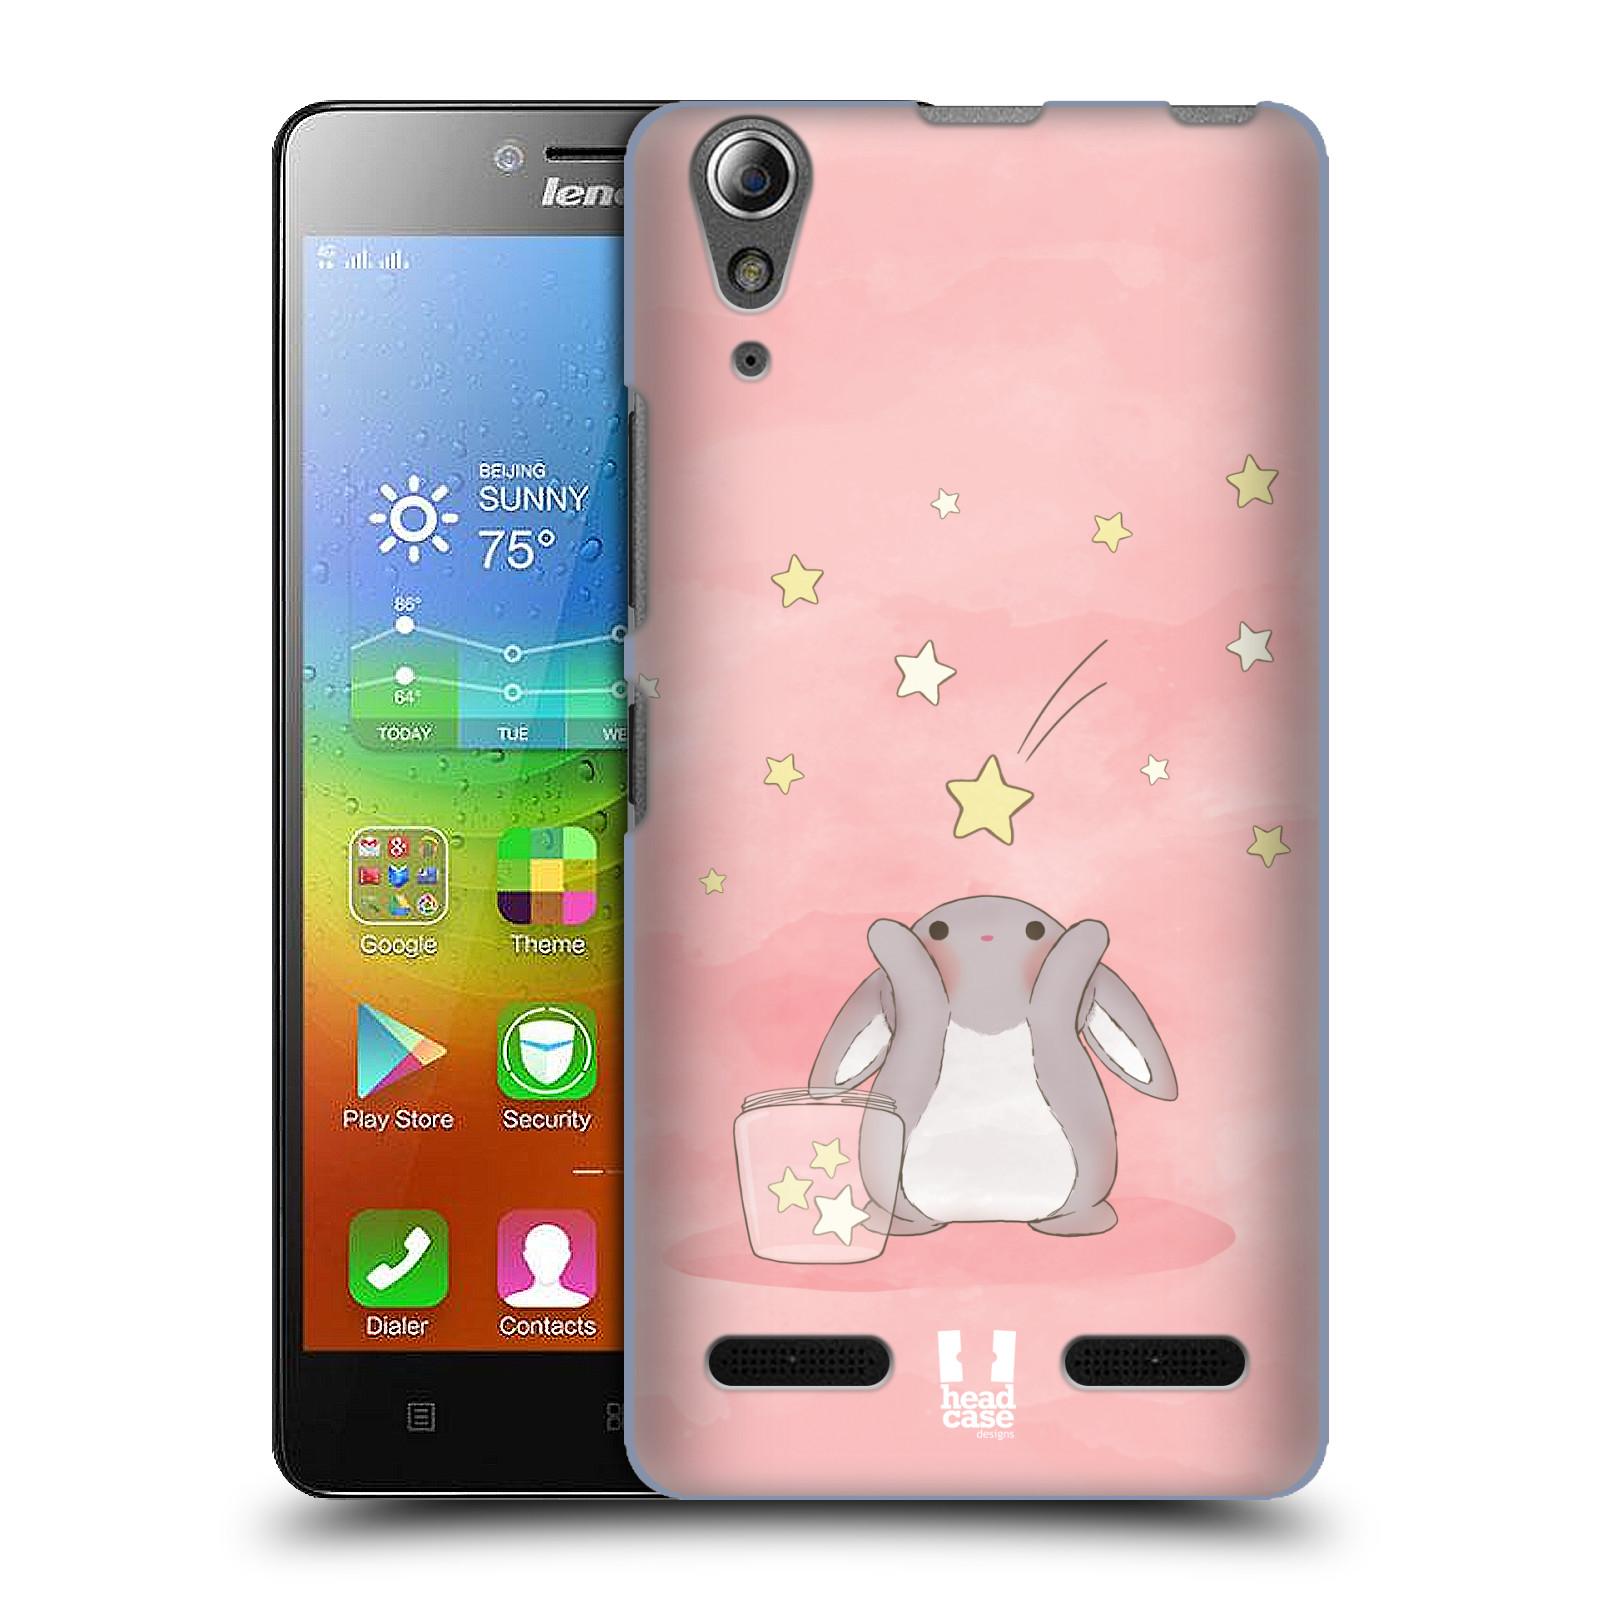 HEAD CASE pevný plastový obal na mobil LENOVO A6000 / A6000 PLUS vzor králíček a hvězdy růžová